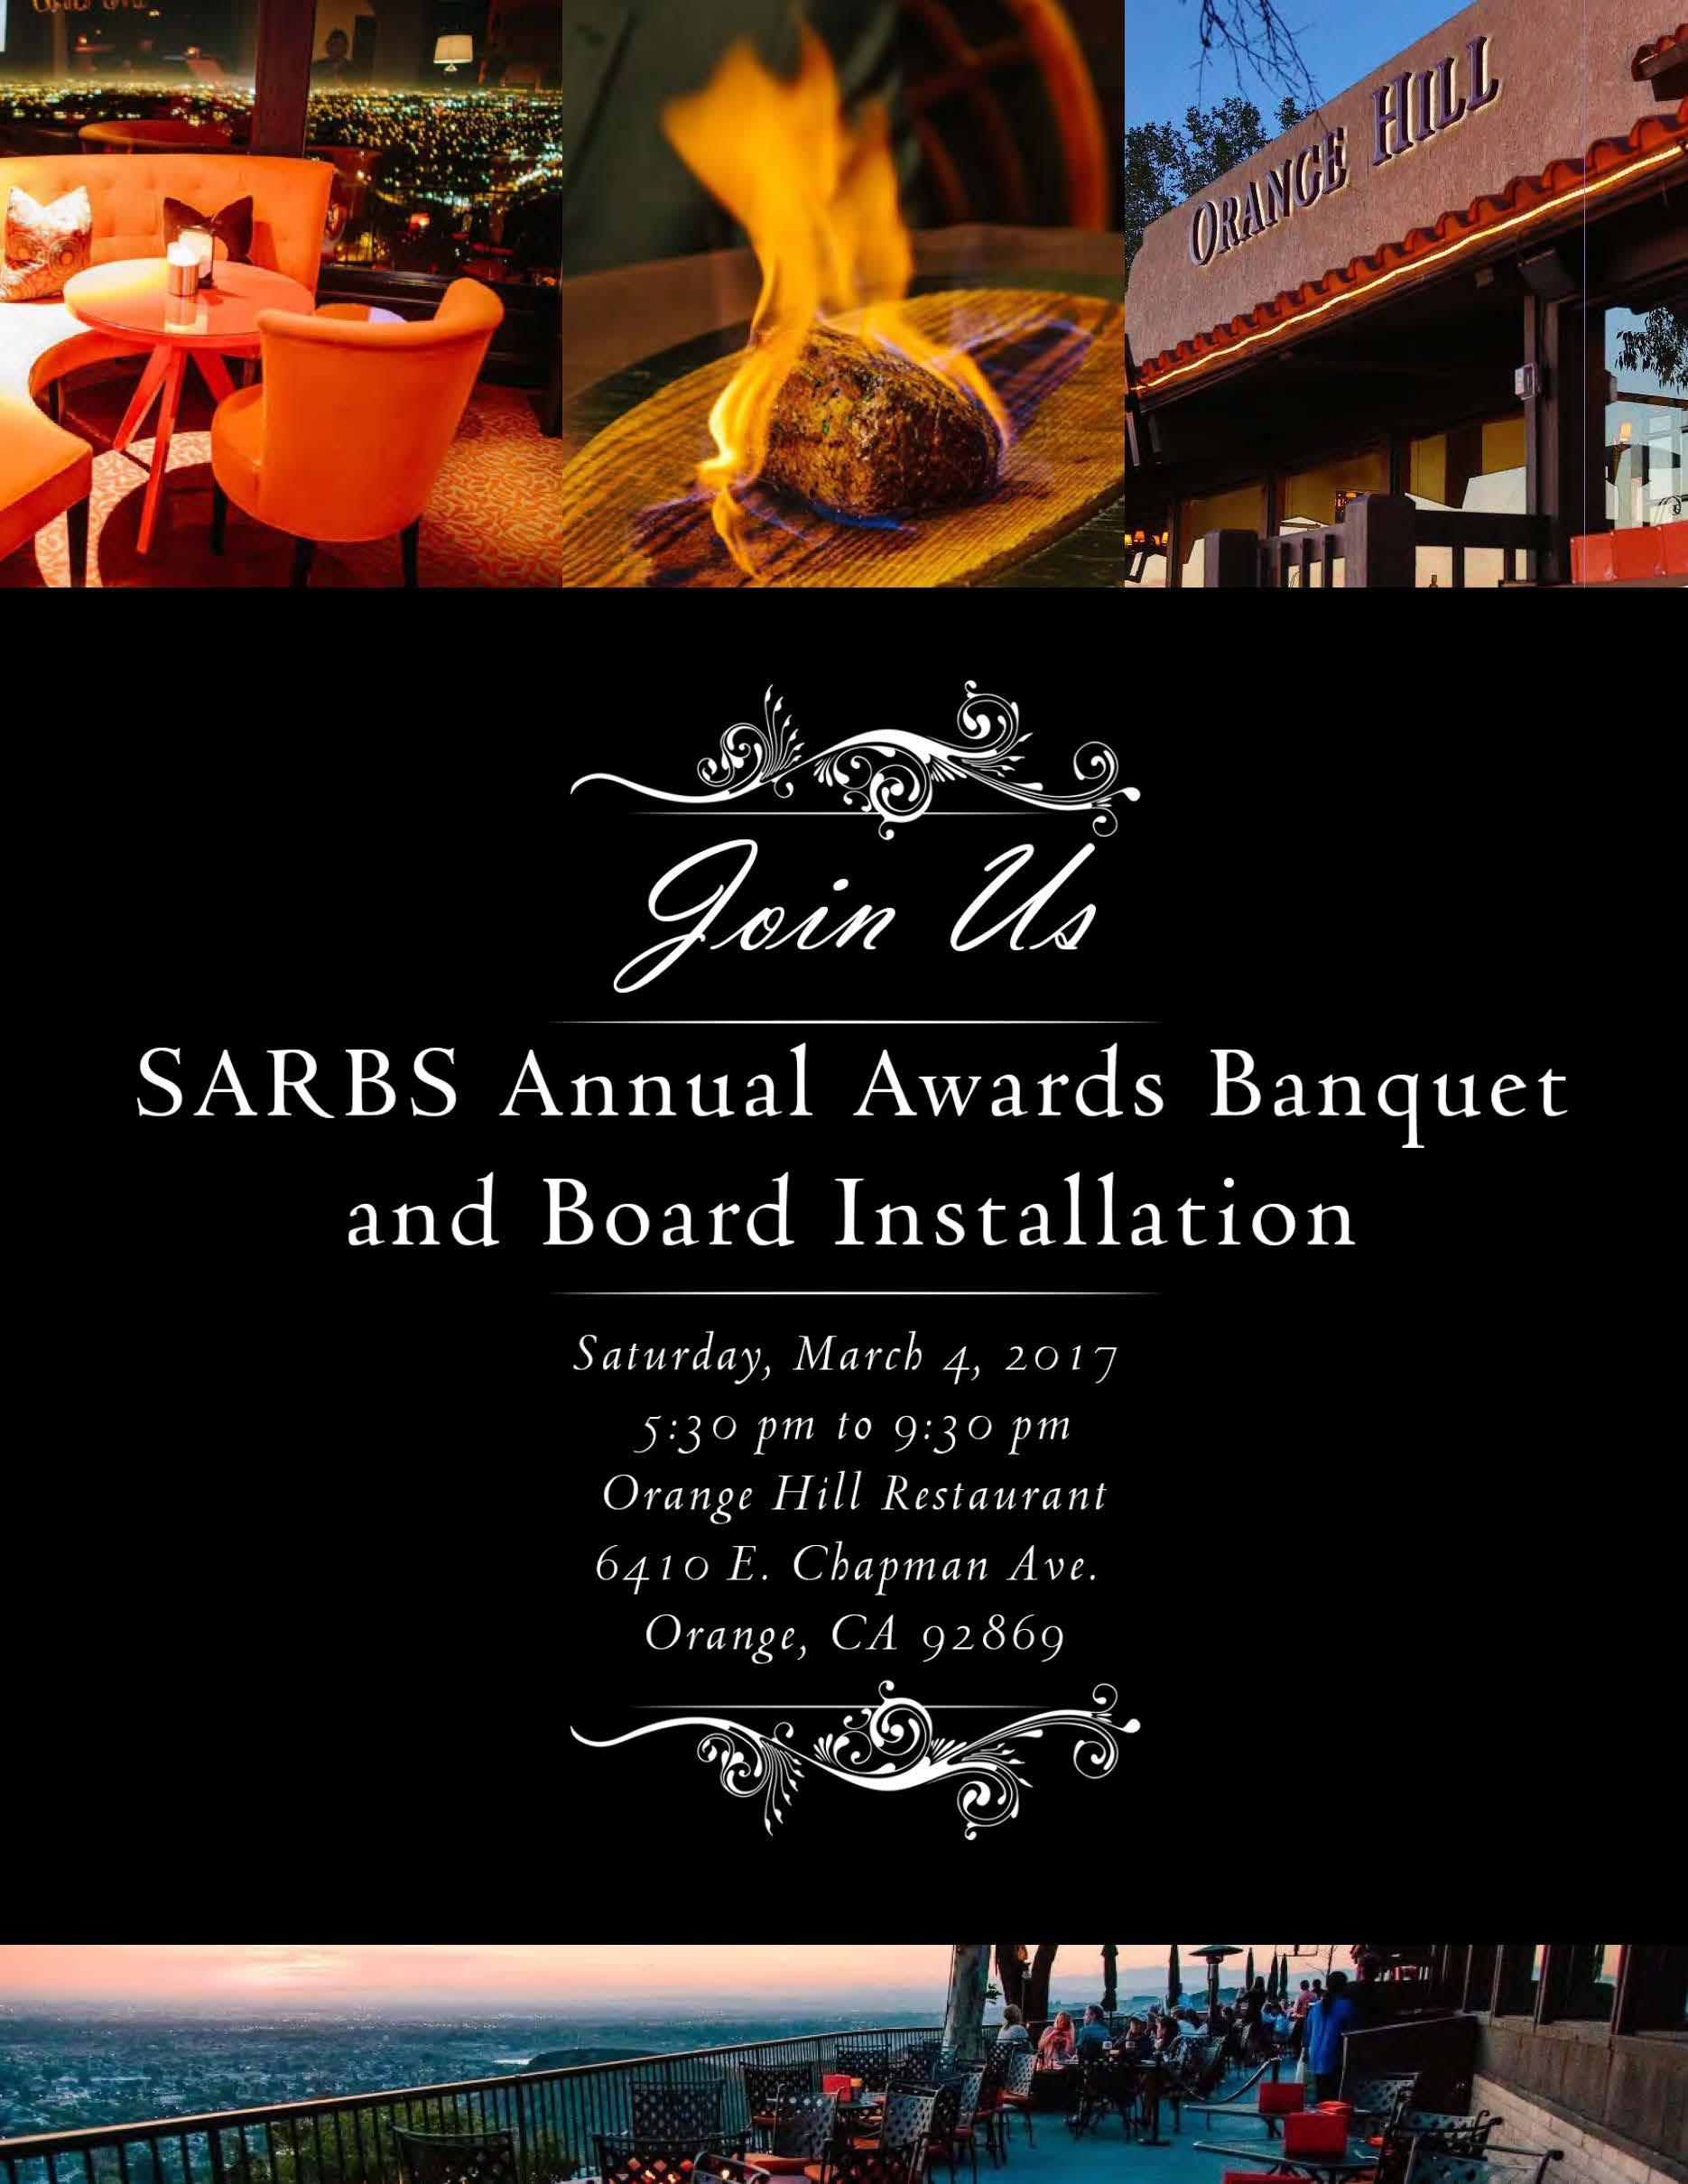 sarbs annual awards banquet 2017 page 1